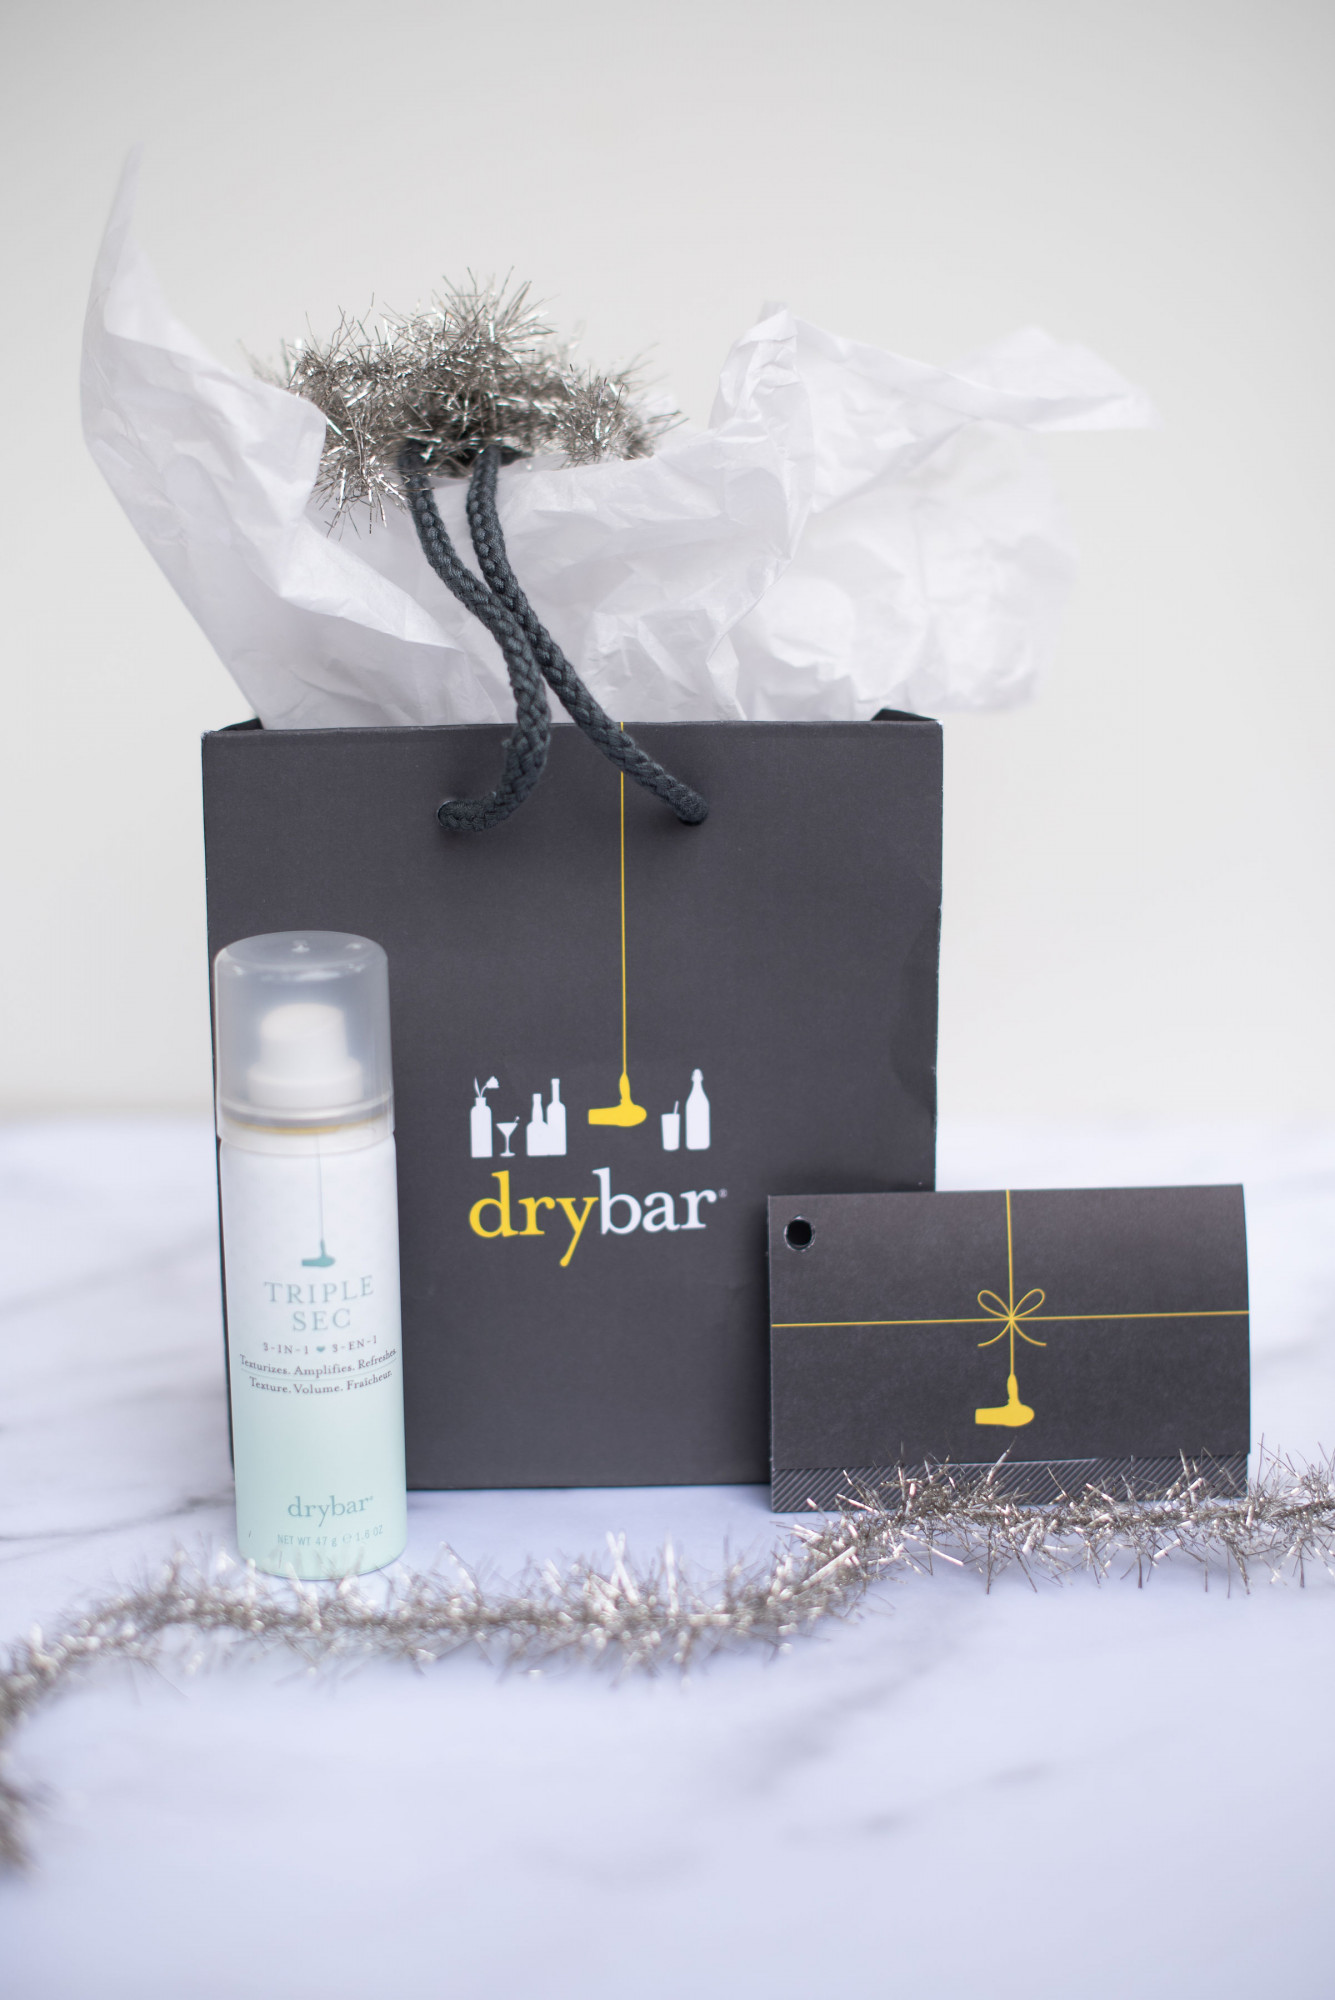 DryBar Giftcard